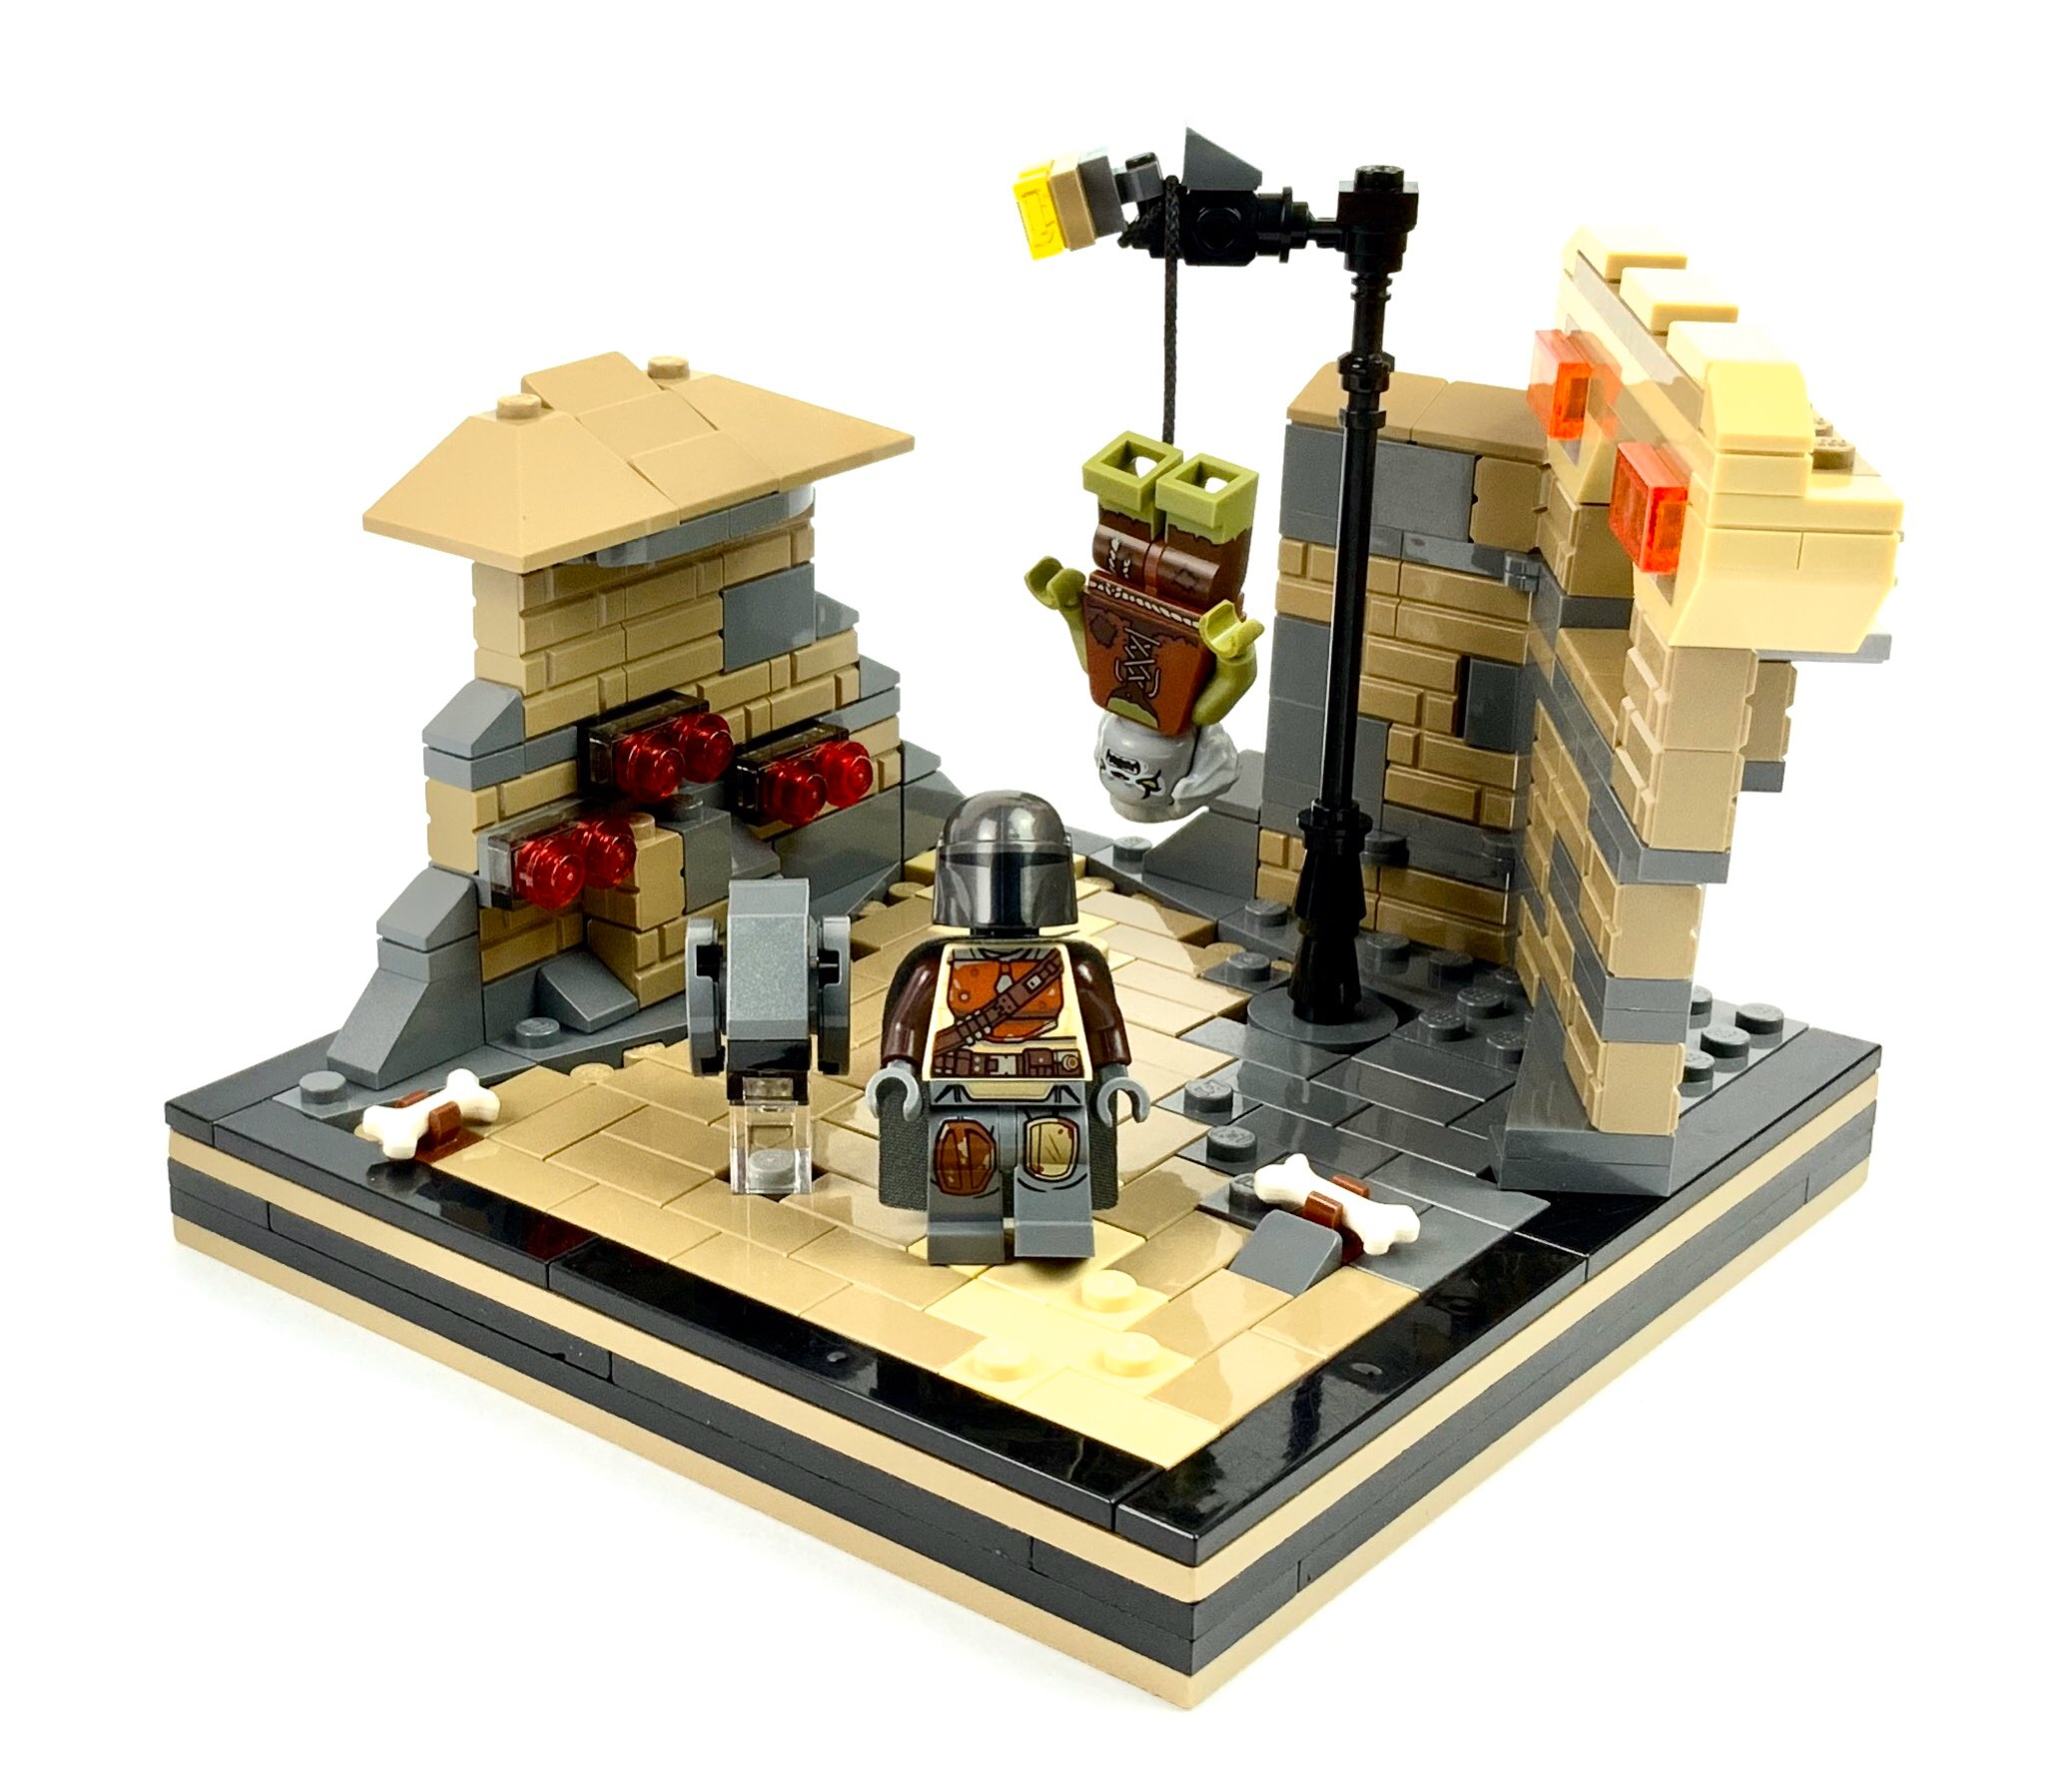 LEGO - The Mandalorian Season 2 (Chapter 10: The Passenger)